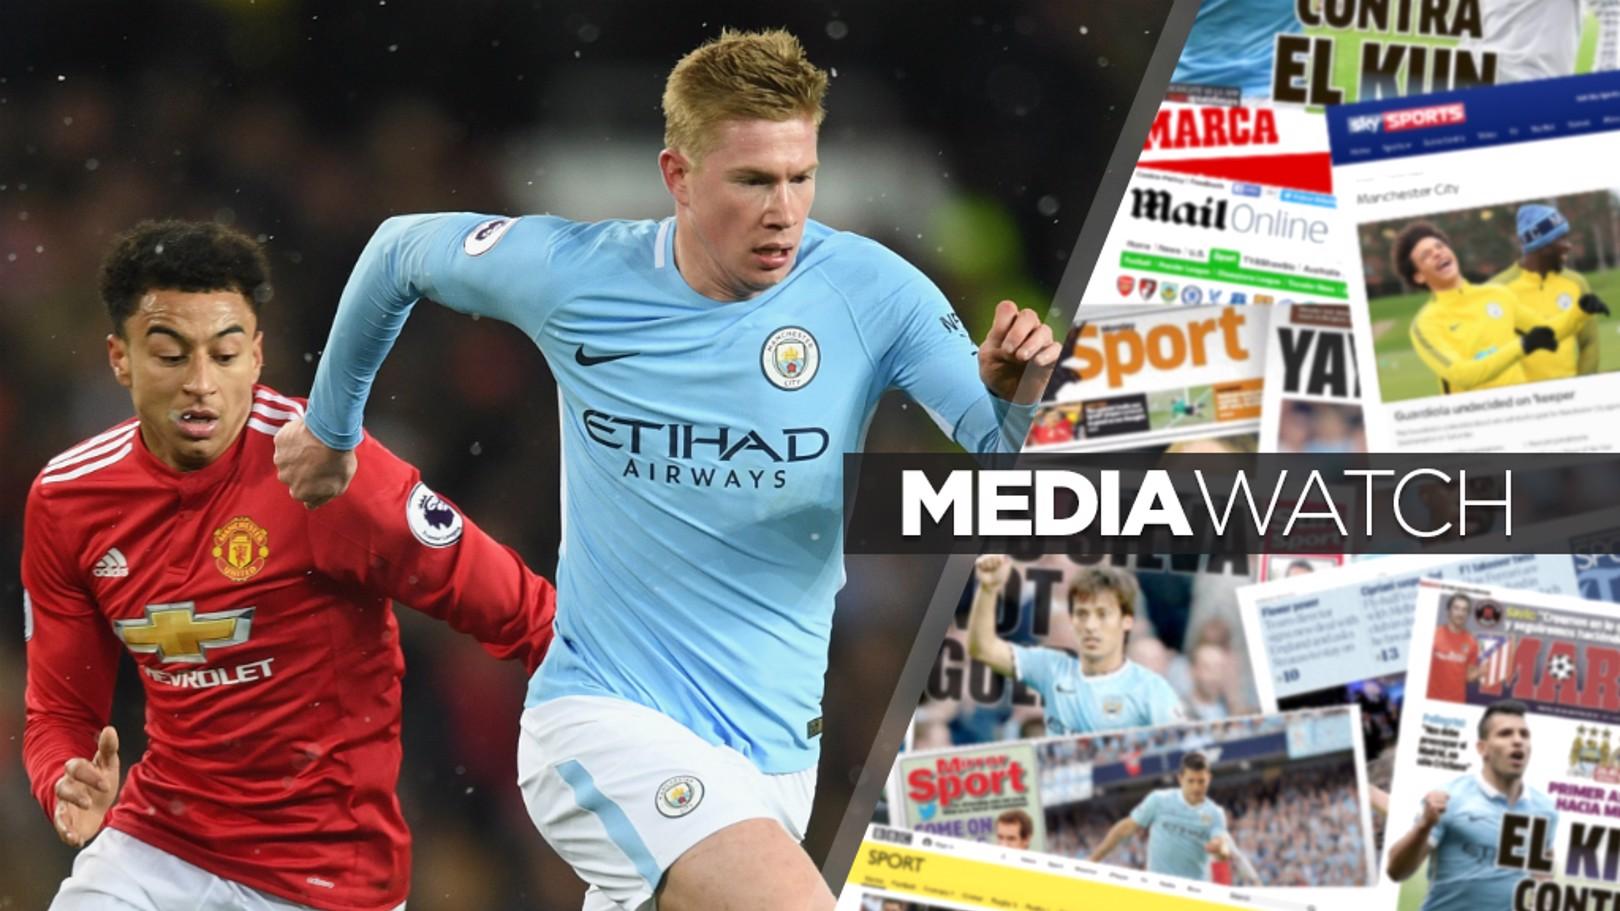 Media Watch: Manchester Derby special